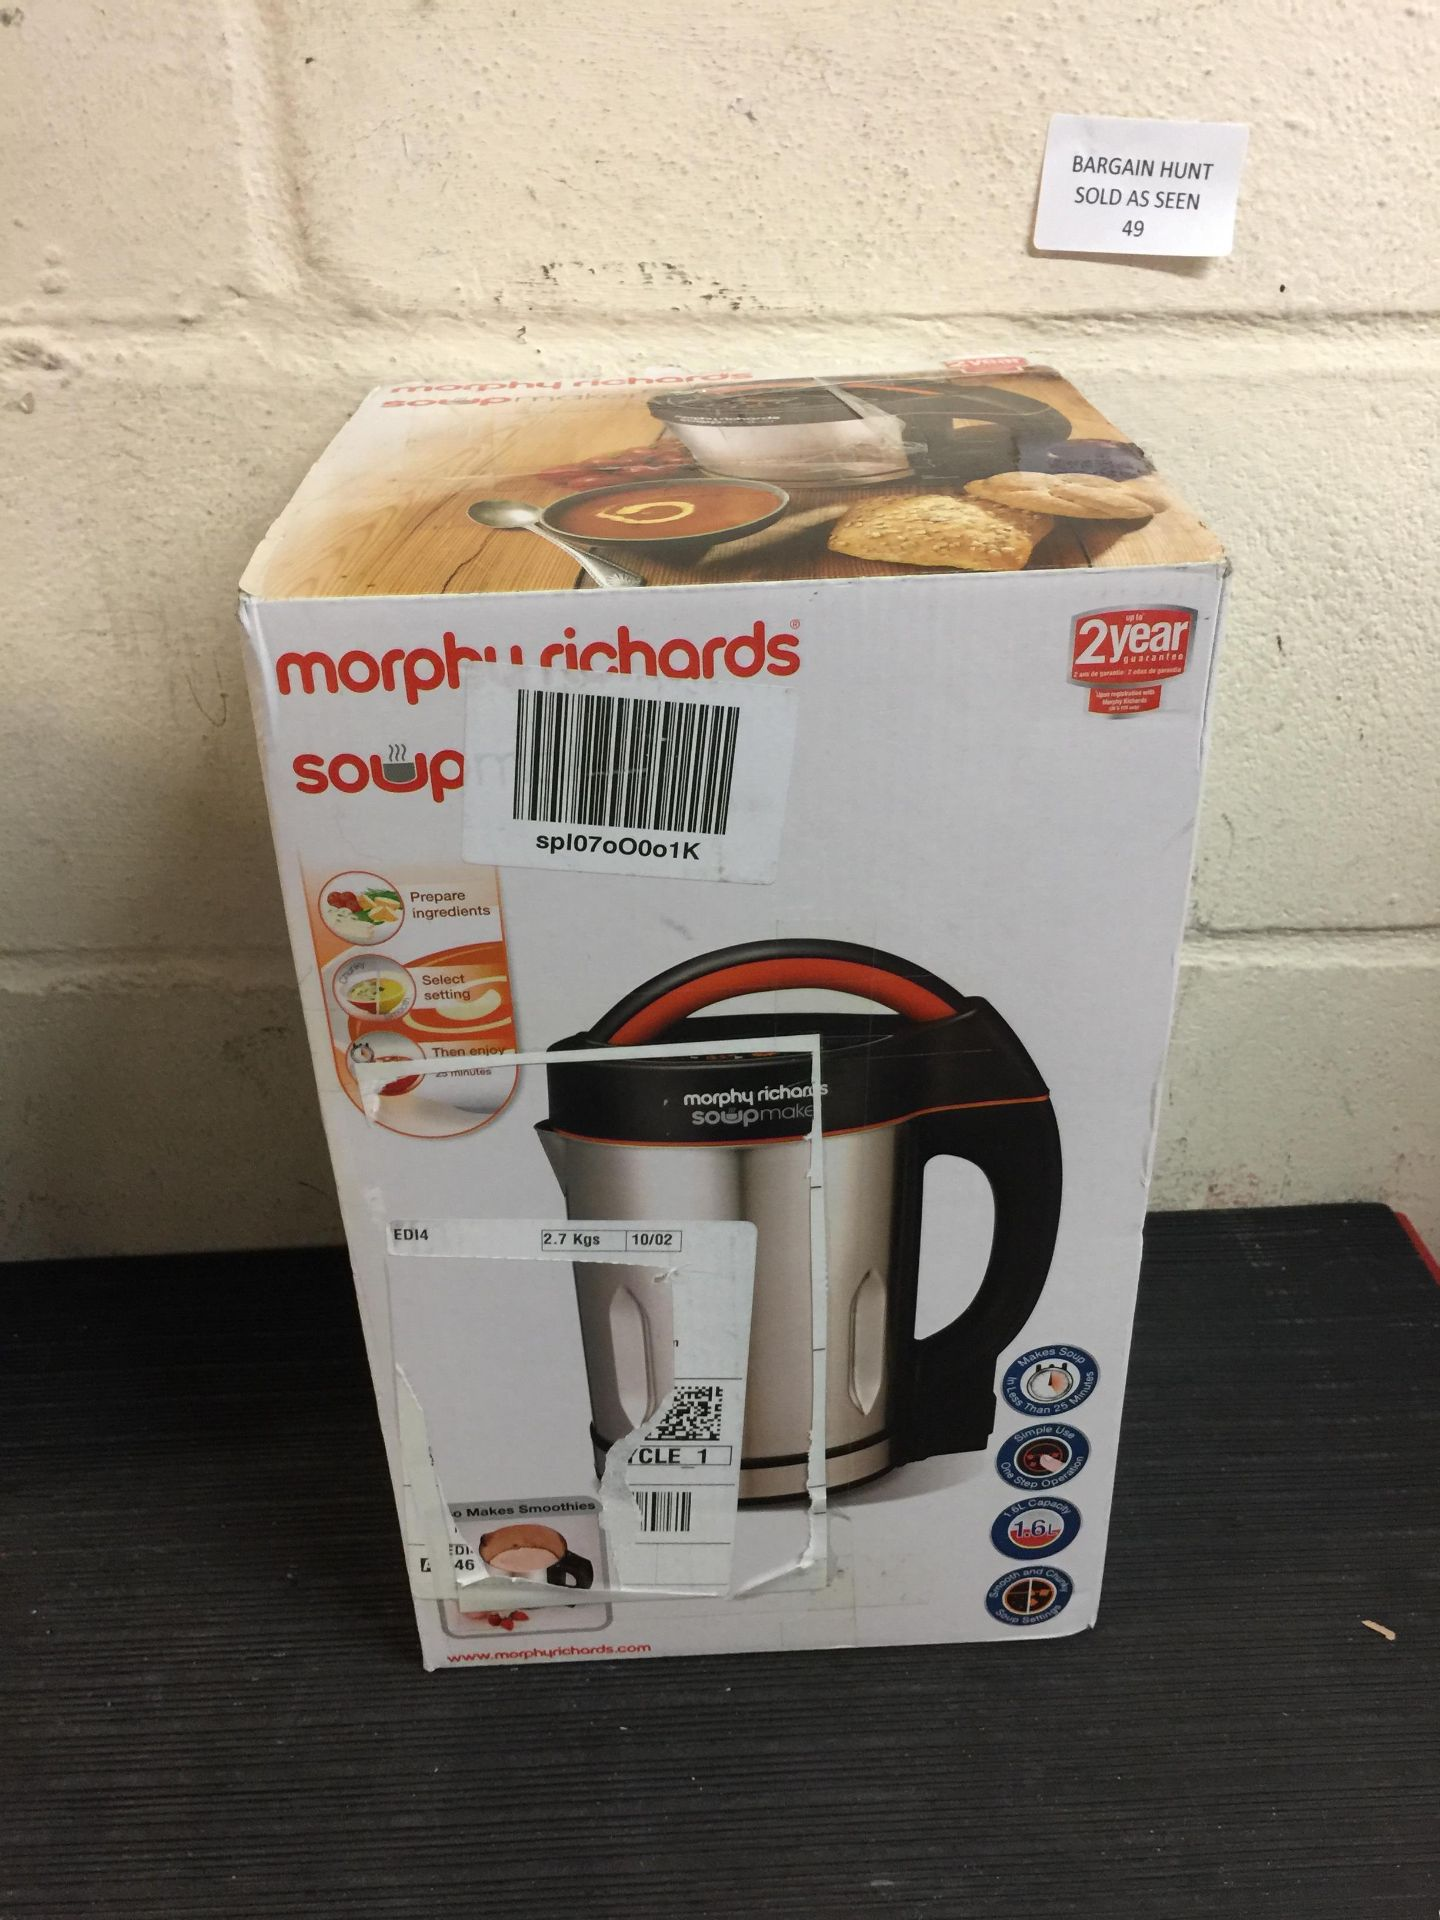 Lot 49 - Morphy Richards Soupmaker 48822 Stainless Steel Soup Maker